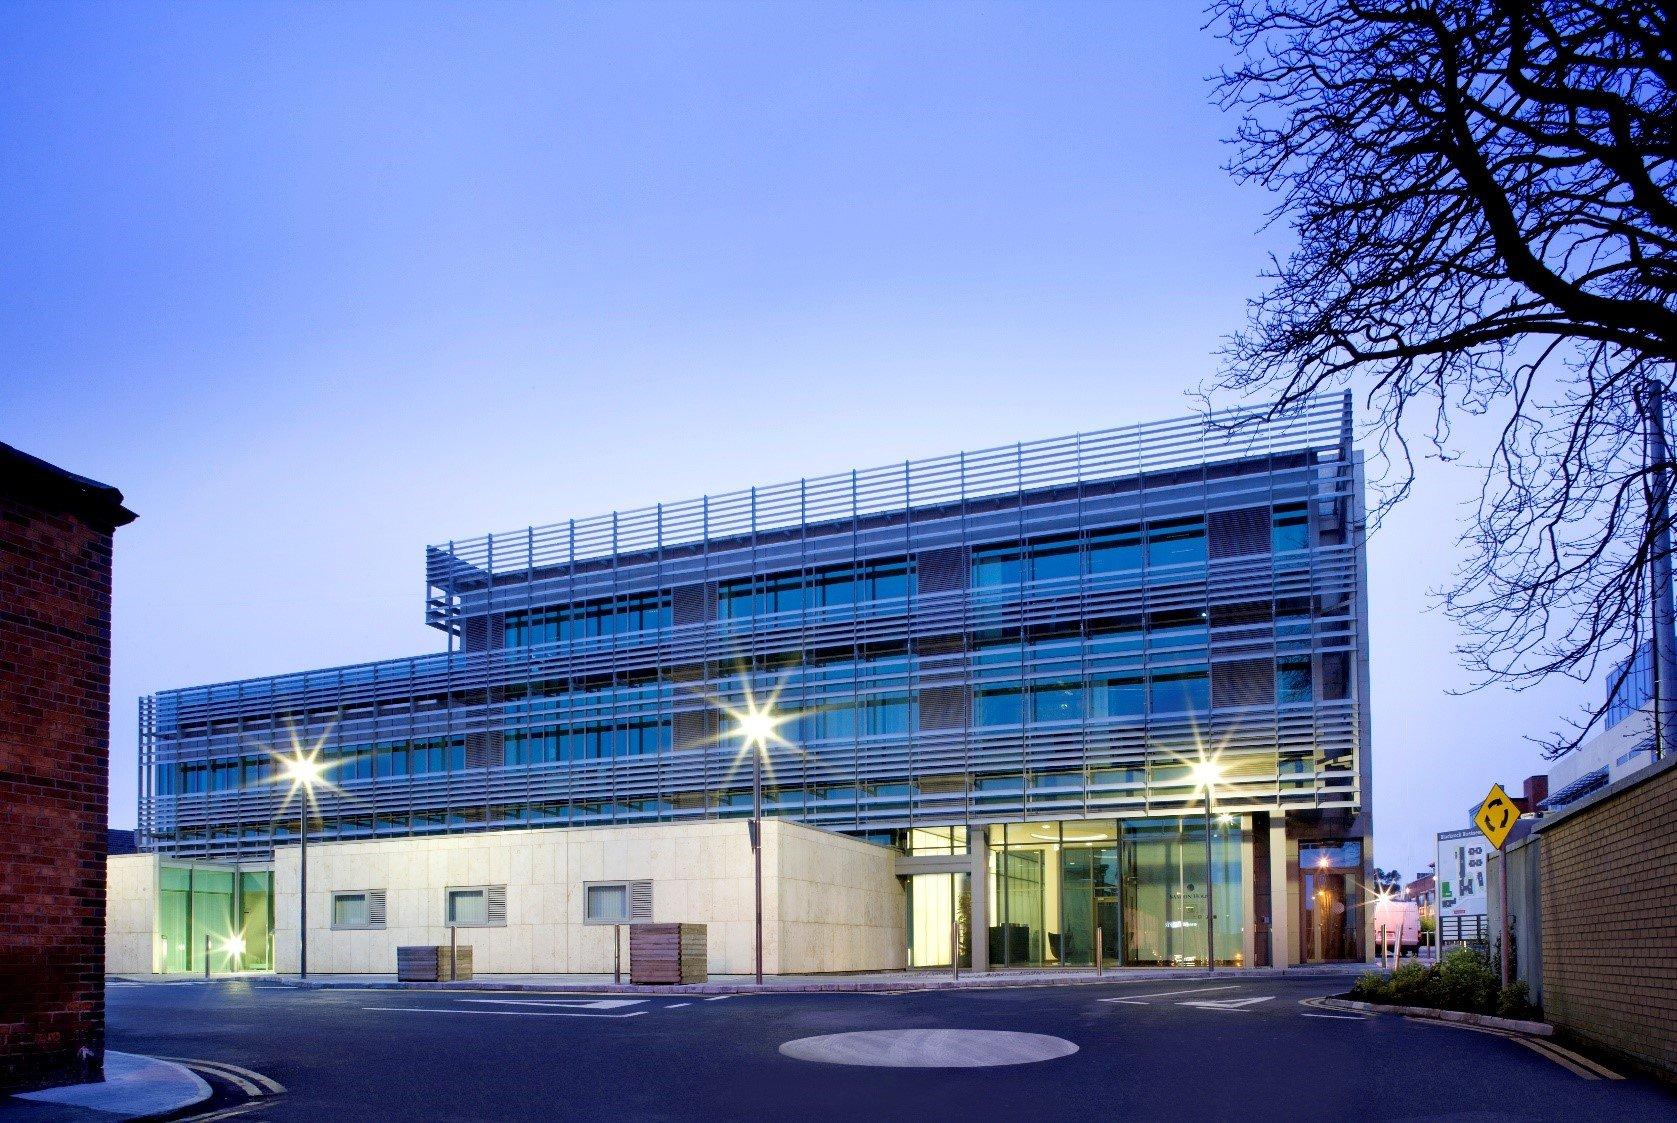 Best hair transplant centre the the world - Samson House